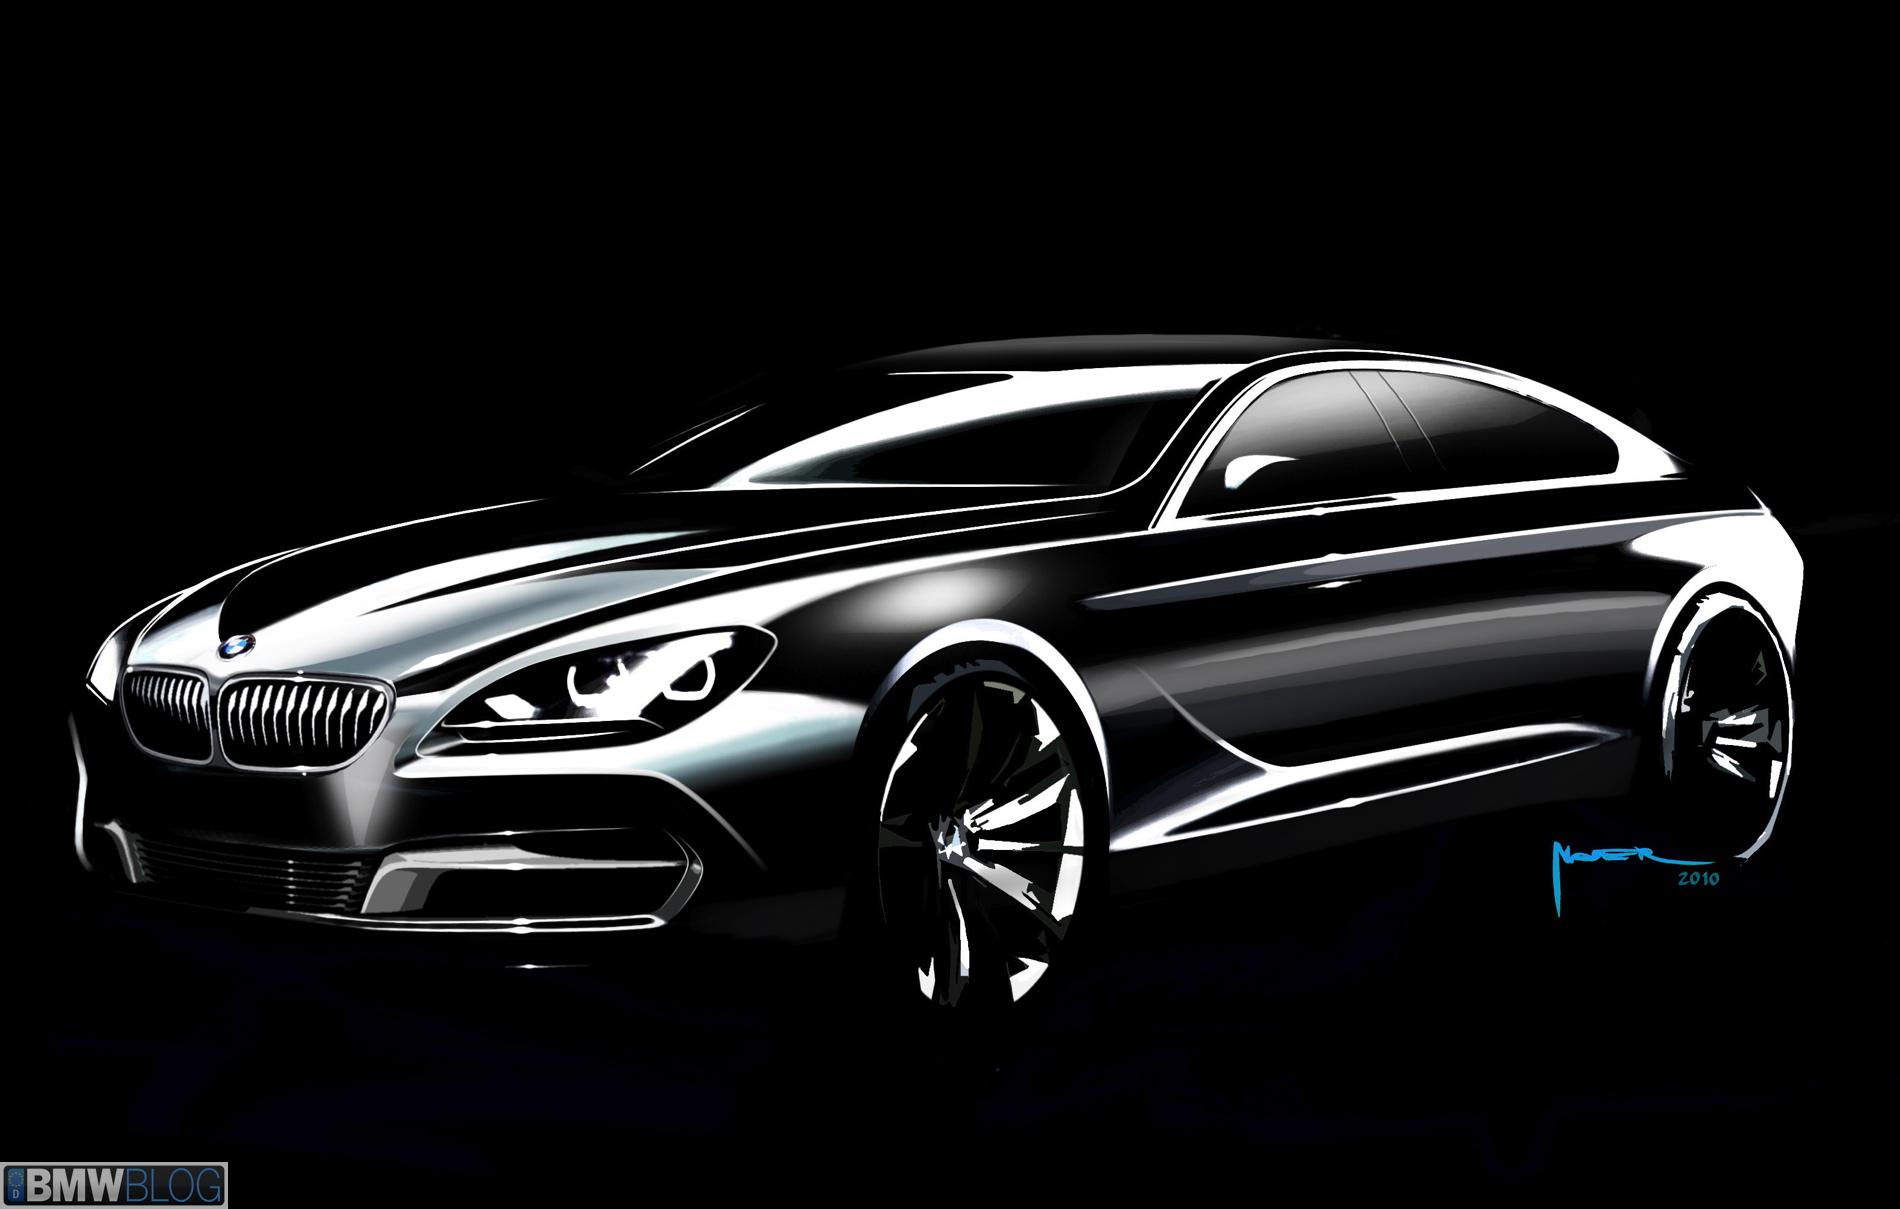 2013 bmw 6 series gran coupe 01